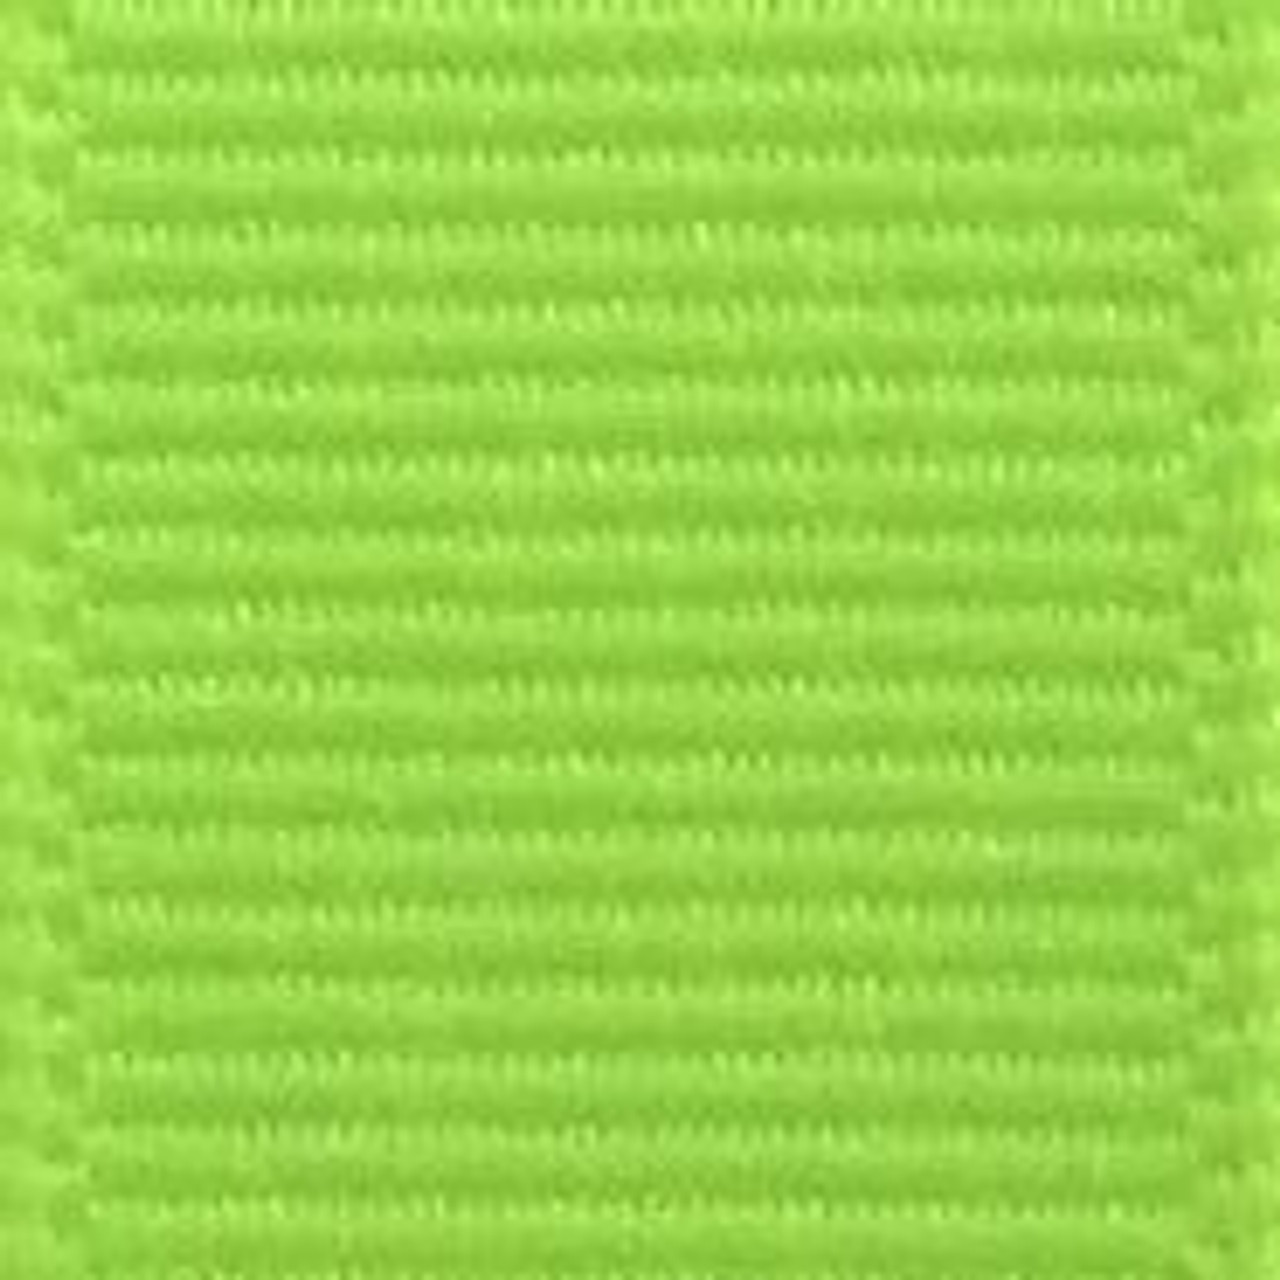 Neon Lime Solid Grosgrain Ribbon